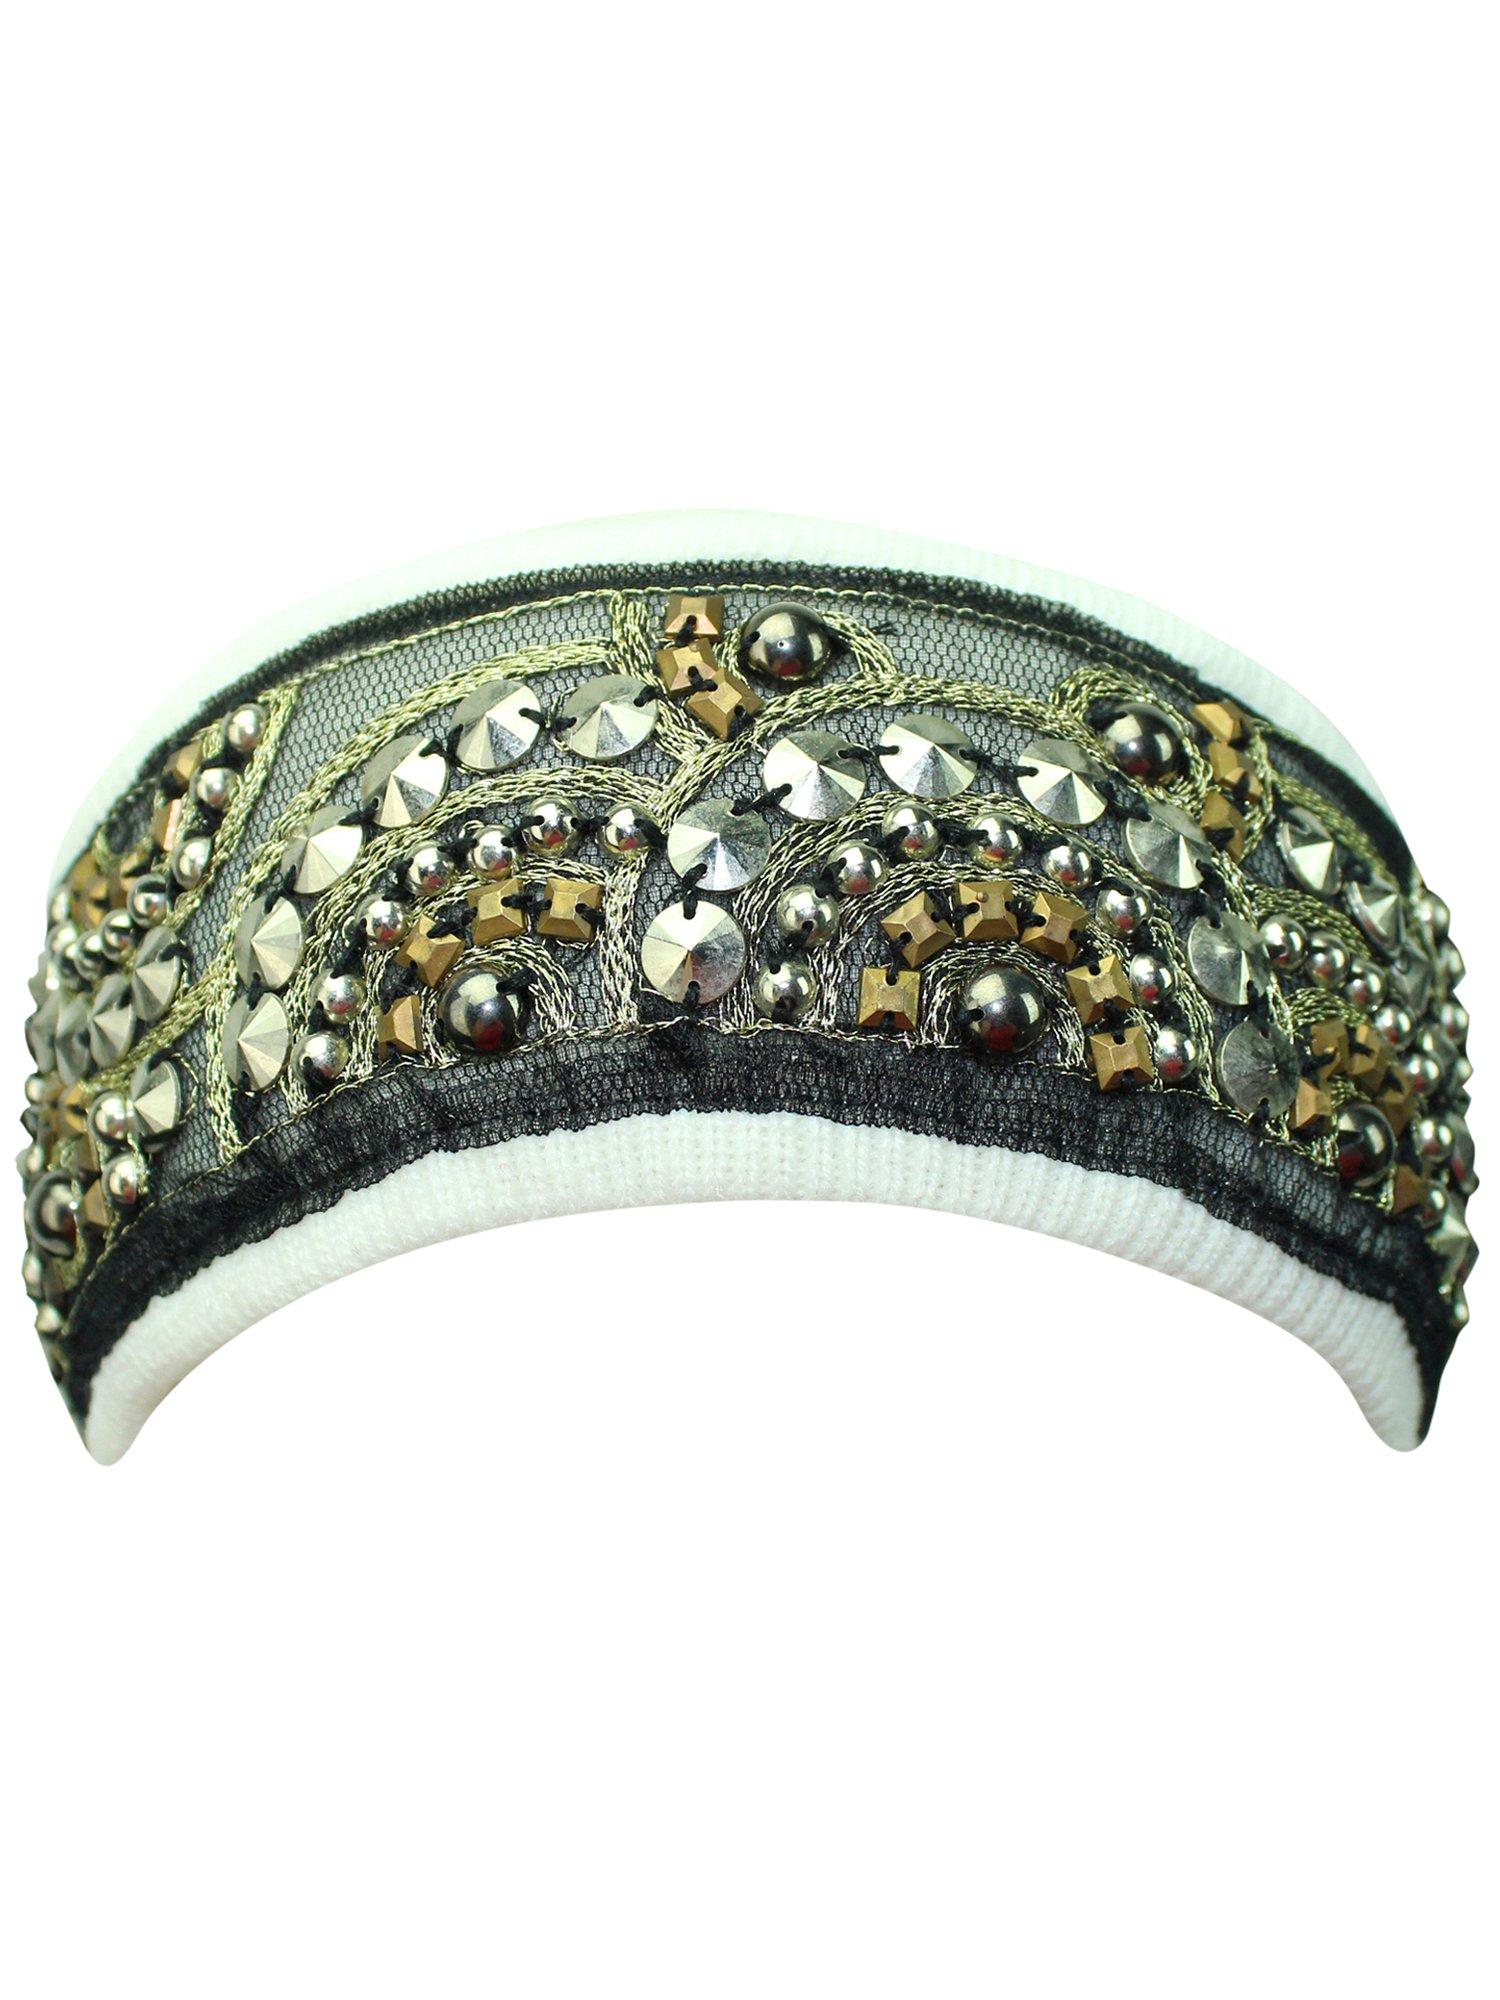 White Bohemian Style Beaded & Studded Headband by Luxury Divas